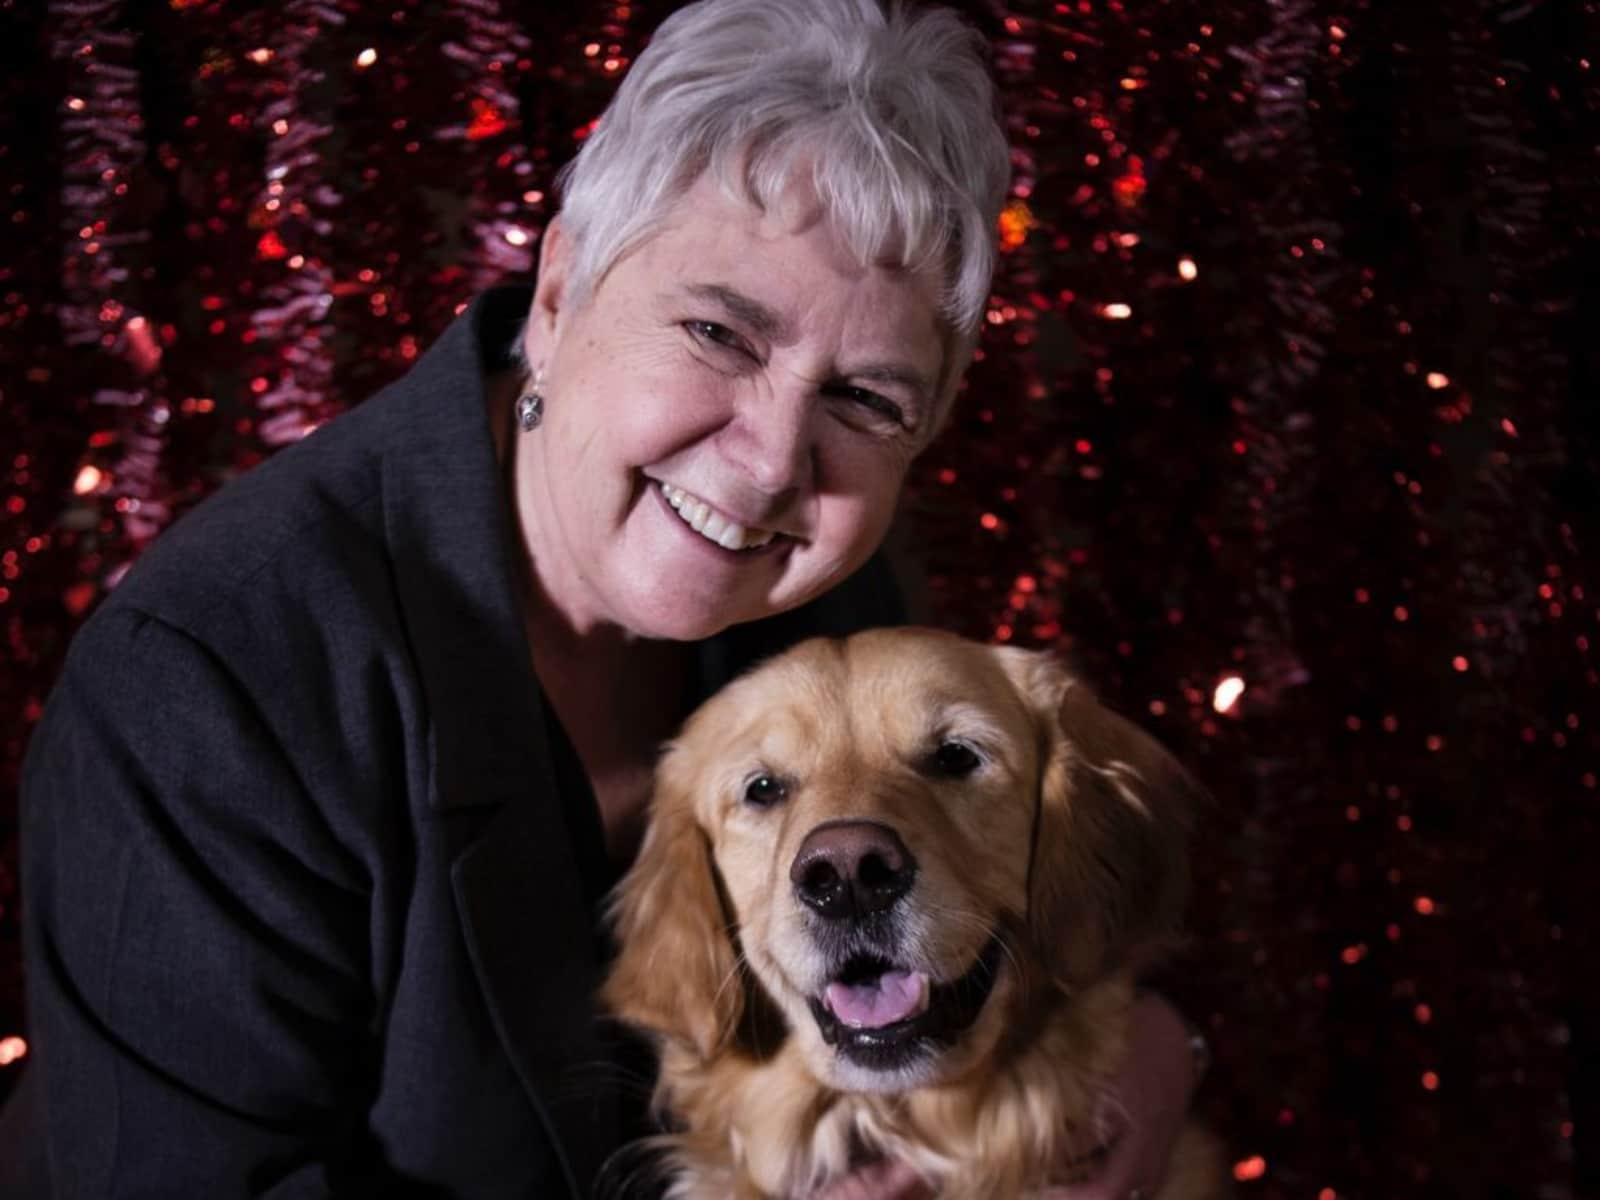 Maureen from Kelowna, British Columbia, Canada